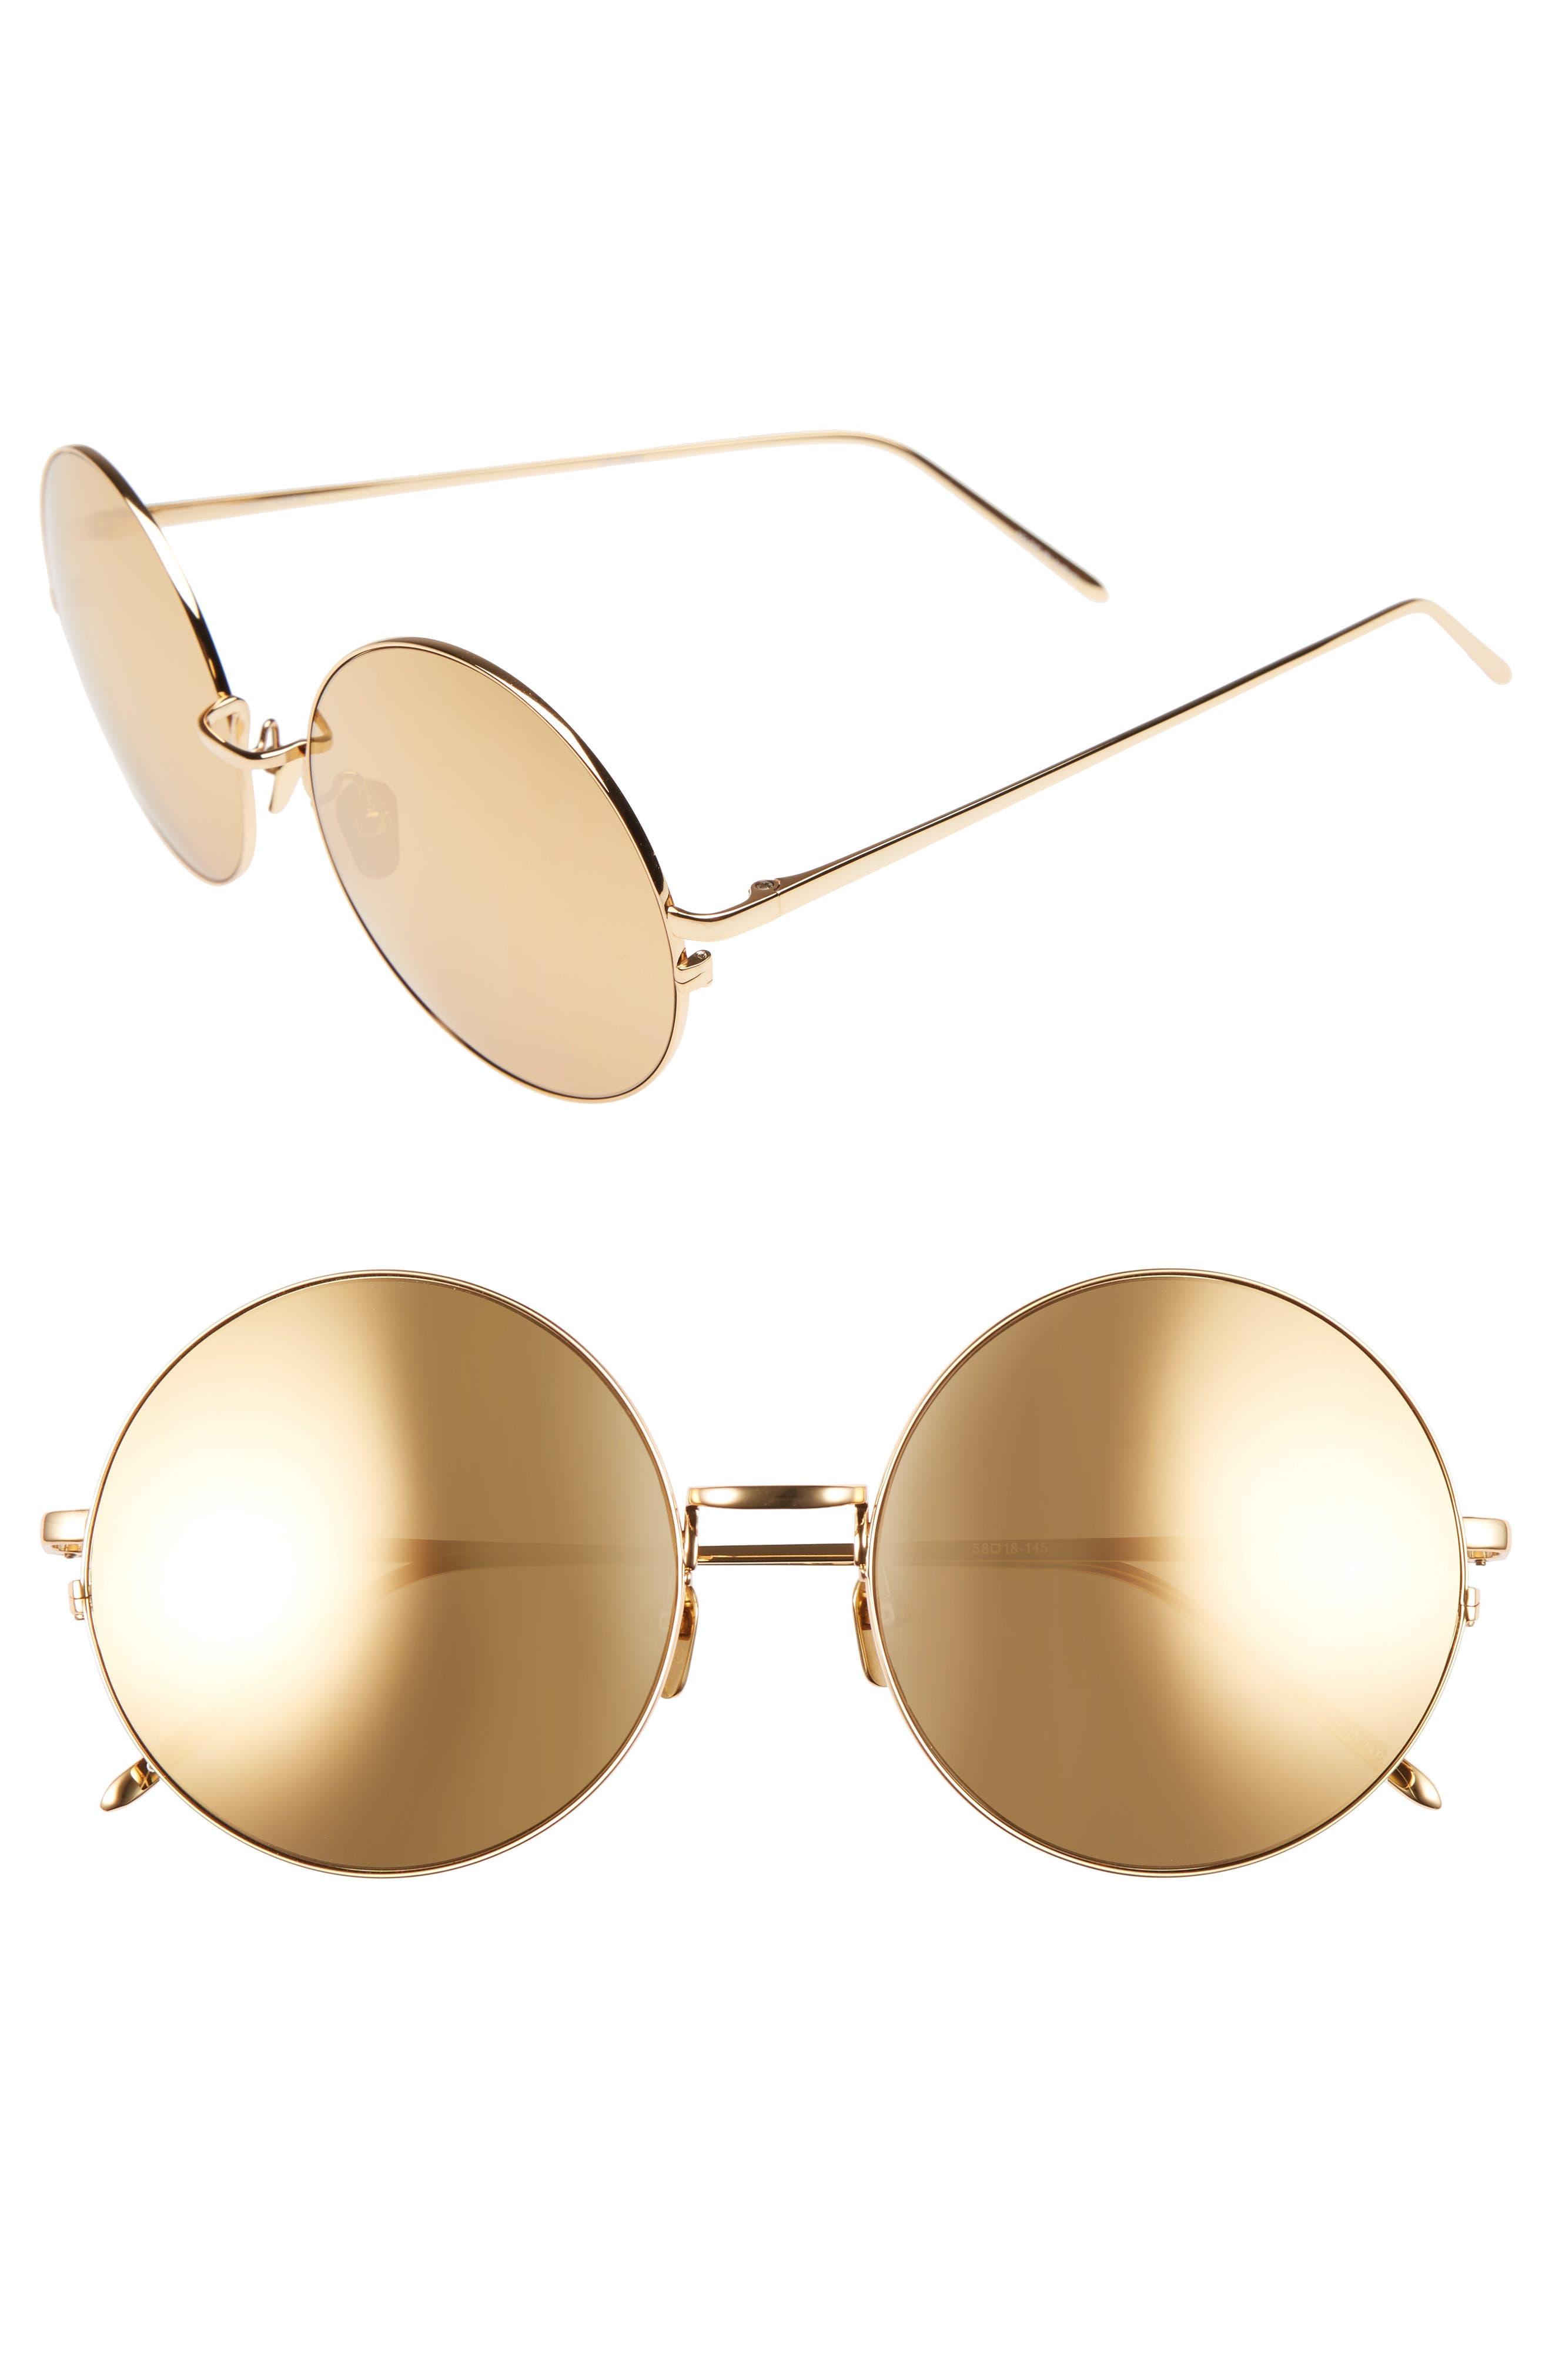 Linda Farrow 58mm 22 Karat Gold Trim Sunglasses